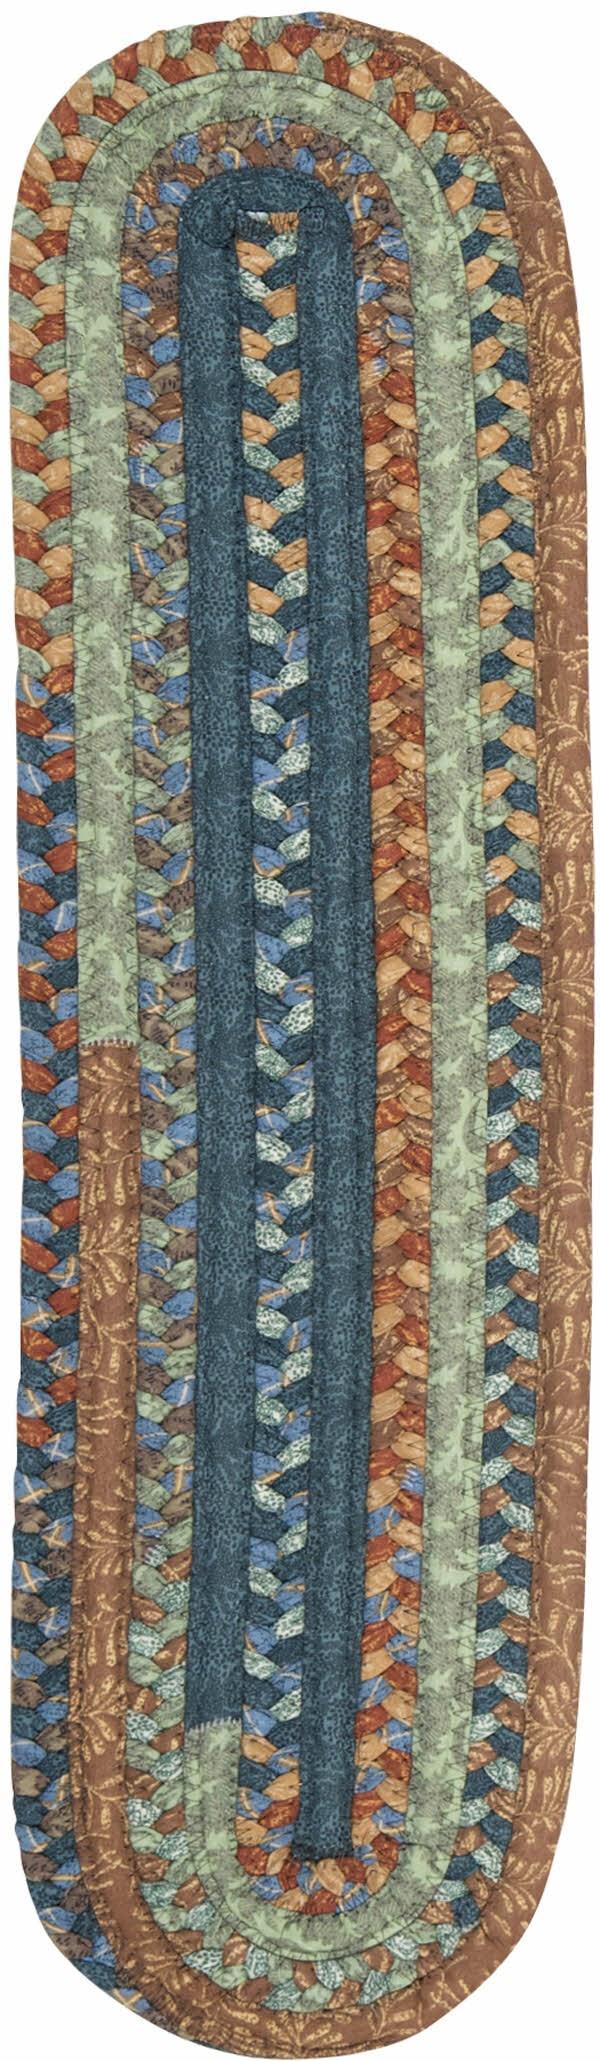 Vintage Blue (OV-59) Country Area Rug